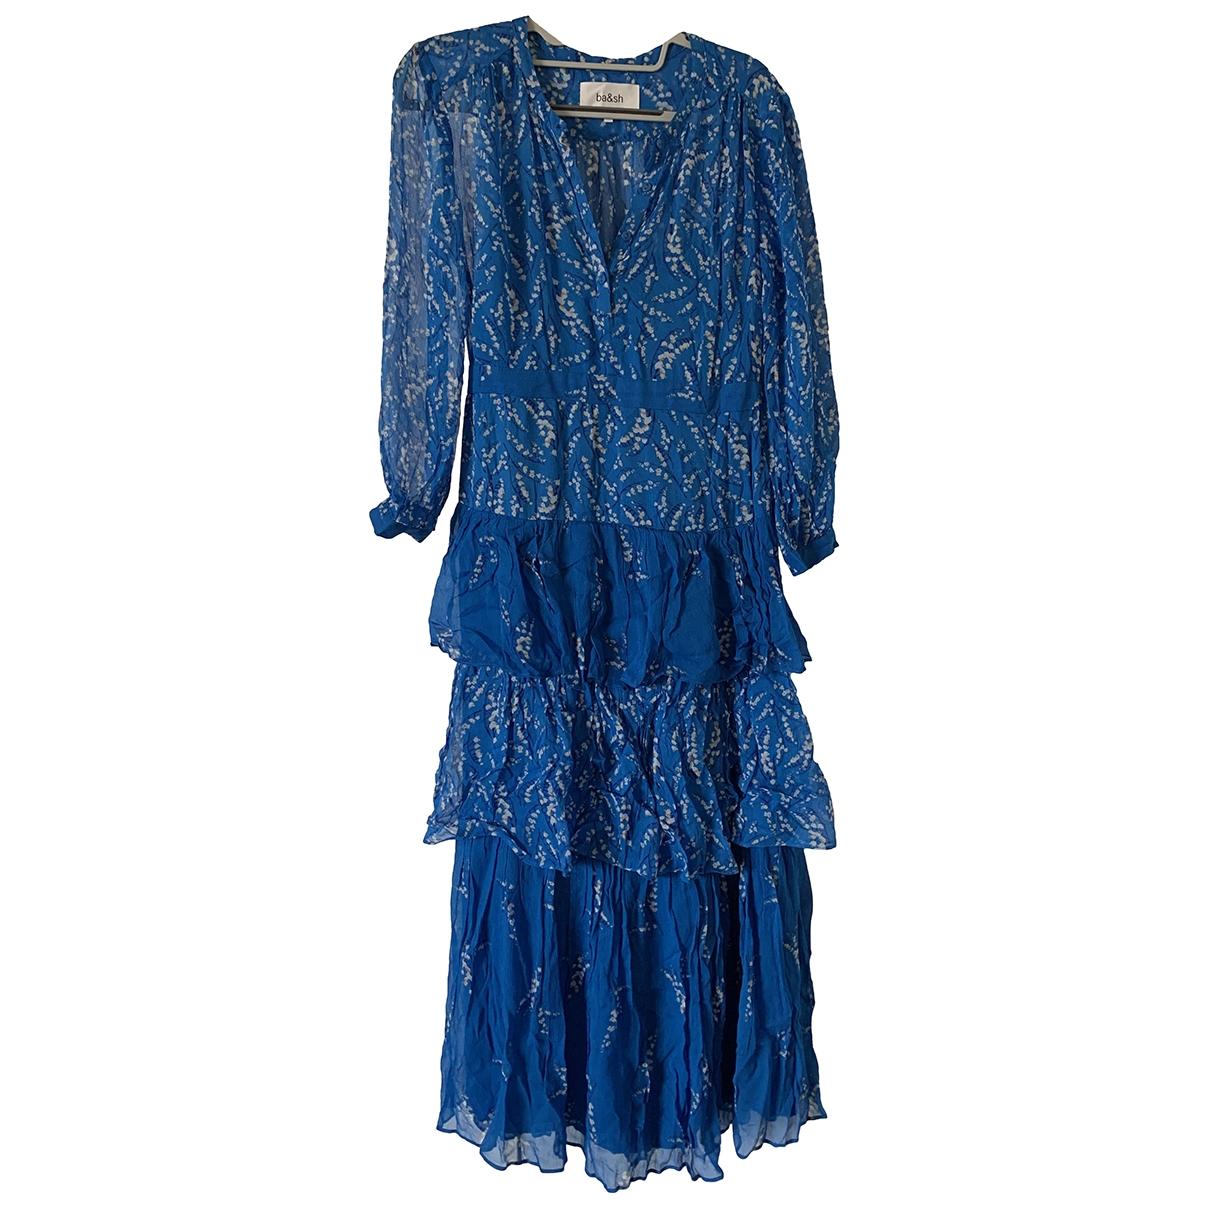 Ba&sh Spring Summer 2020 Kleid in  Blau Polyester